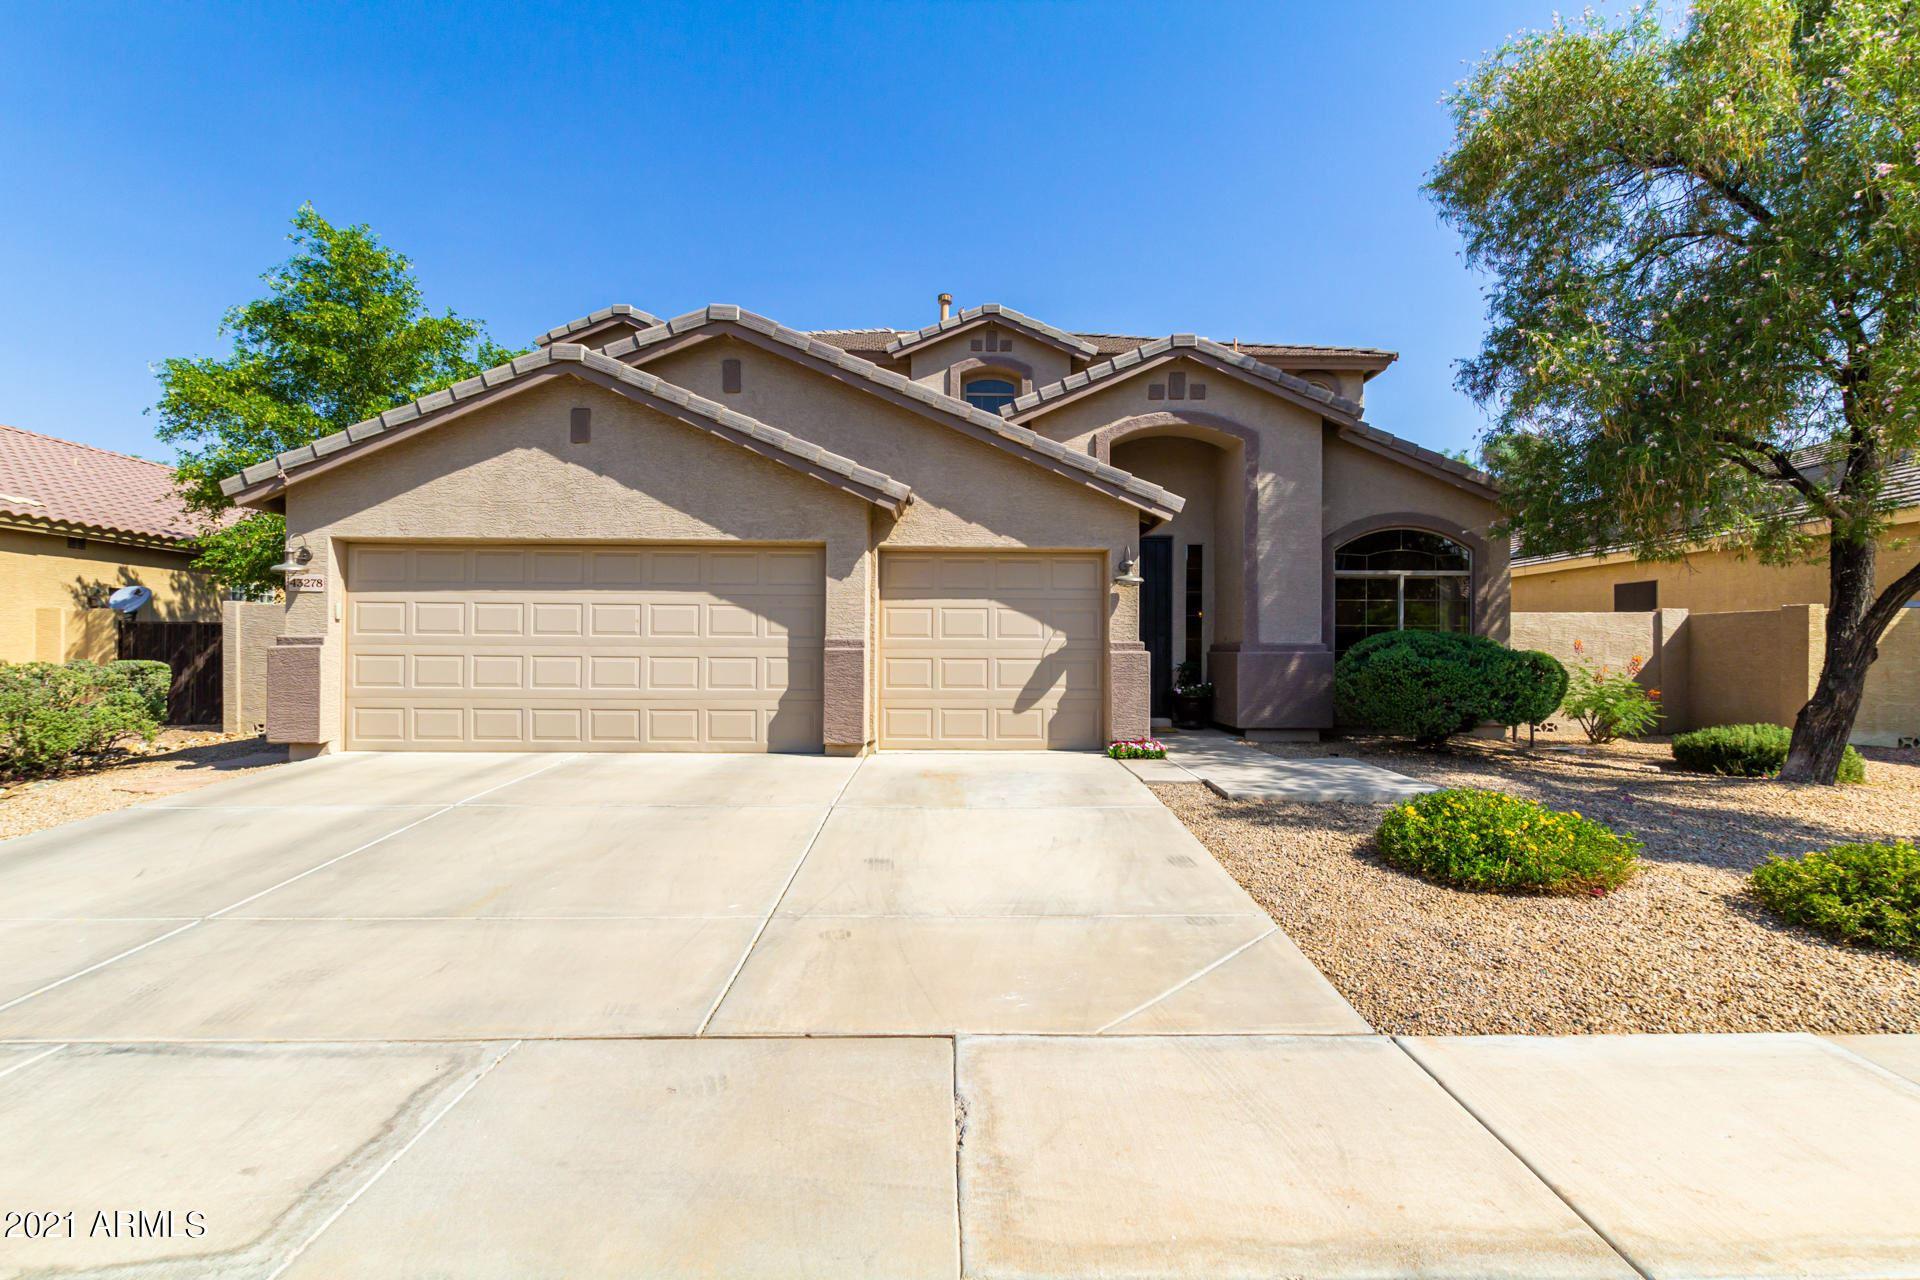 Photo for 43278 W VENTURE Road, Maricopa, AZ 85138 (MLS # 6251245)